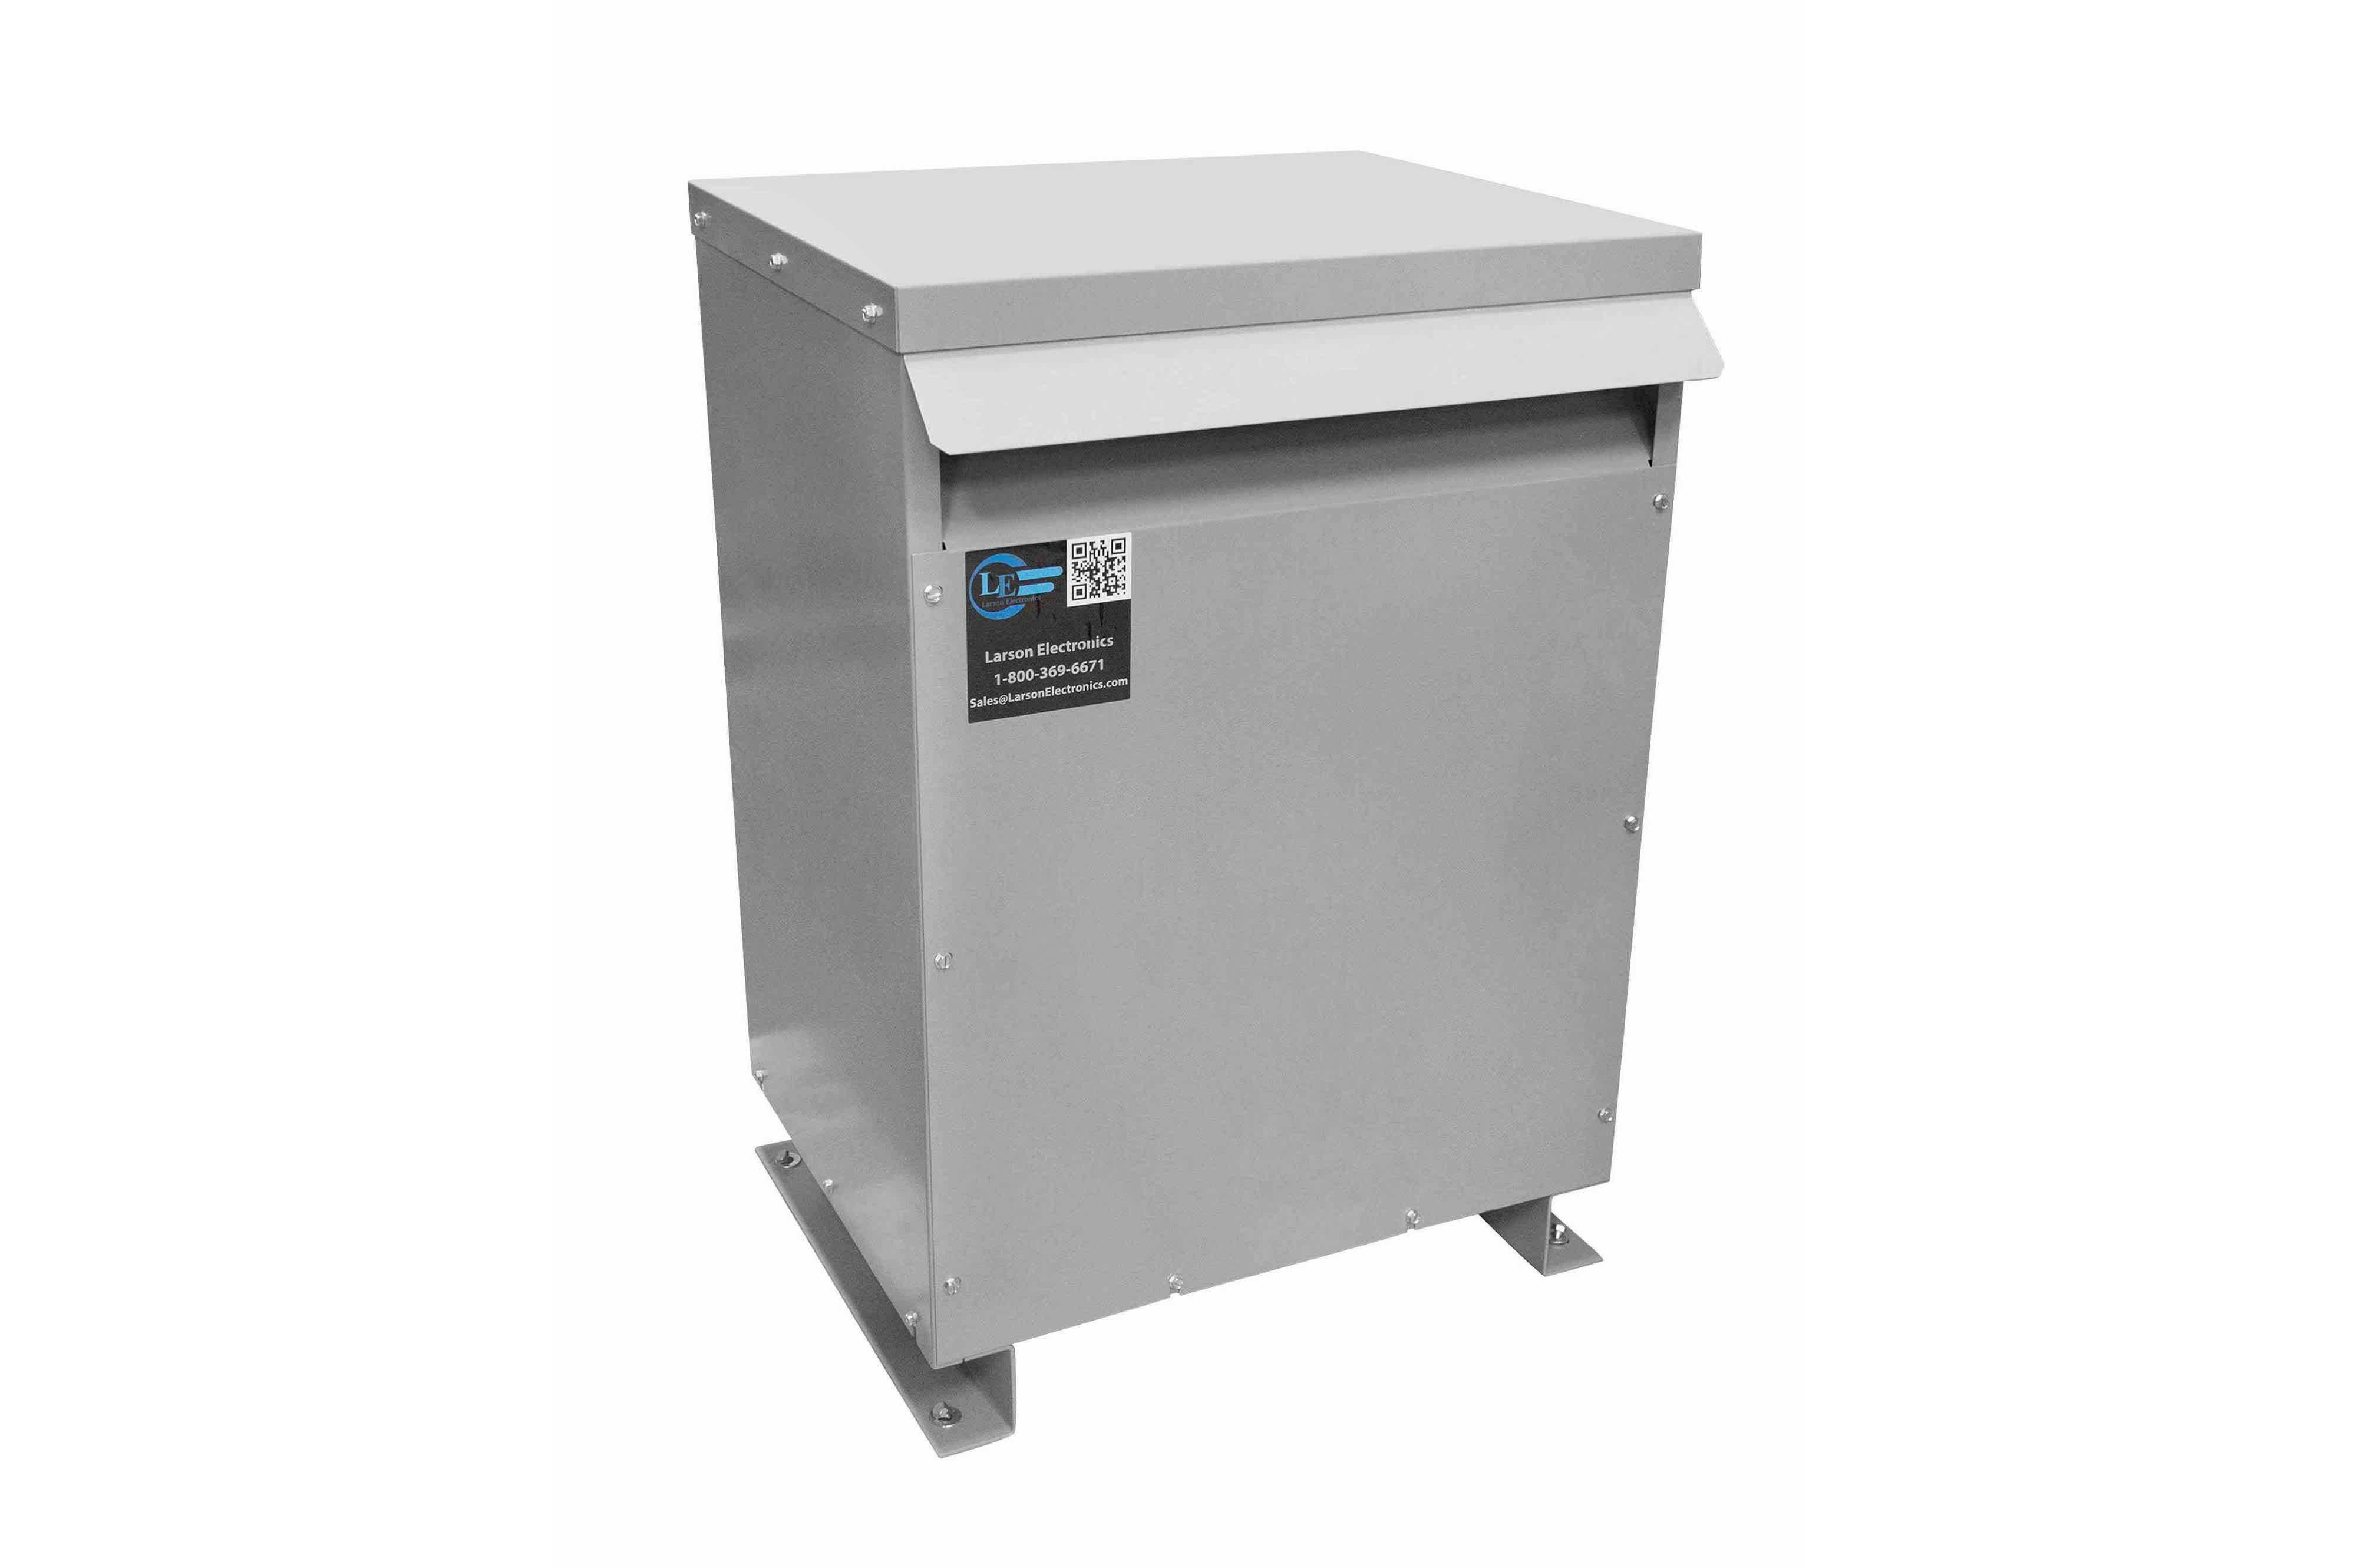 28 kVA 3PH Isolation Transformer, 208V Wye Primary, 208Y/120 Wye-N Secondary, N3R, Ventilated, 60 Hz